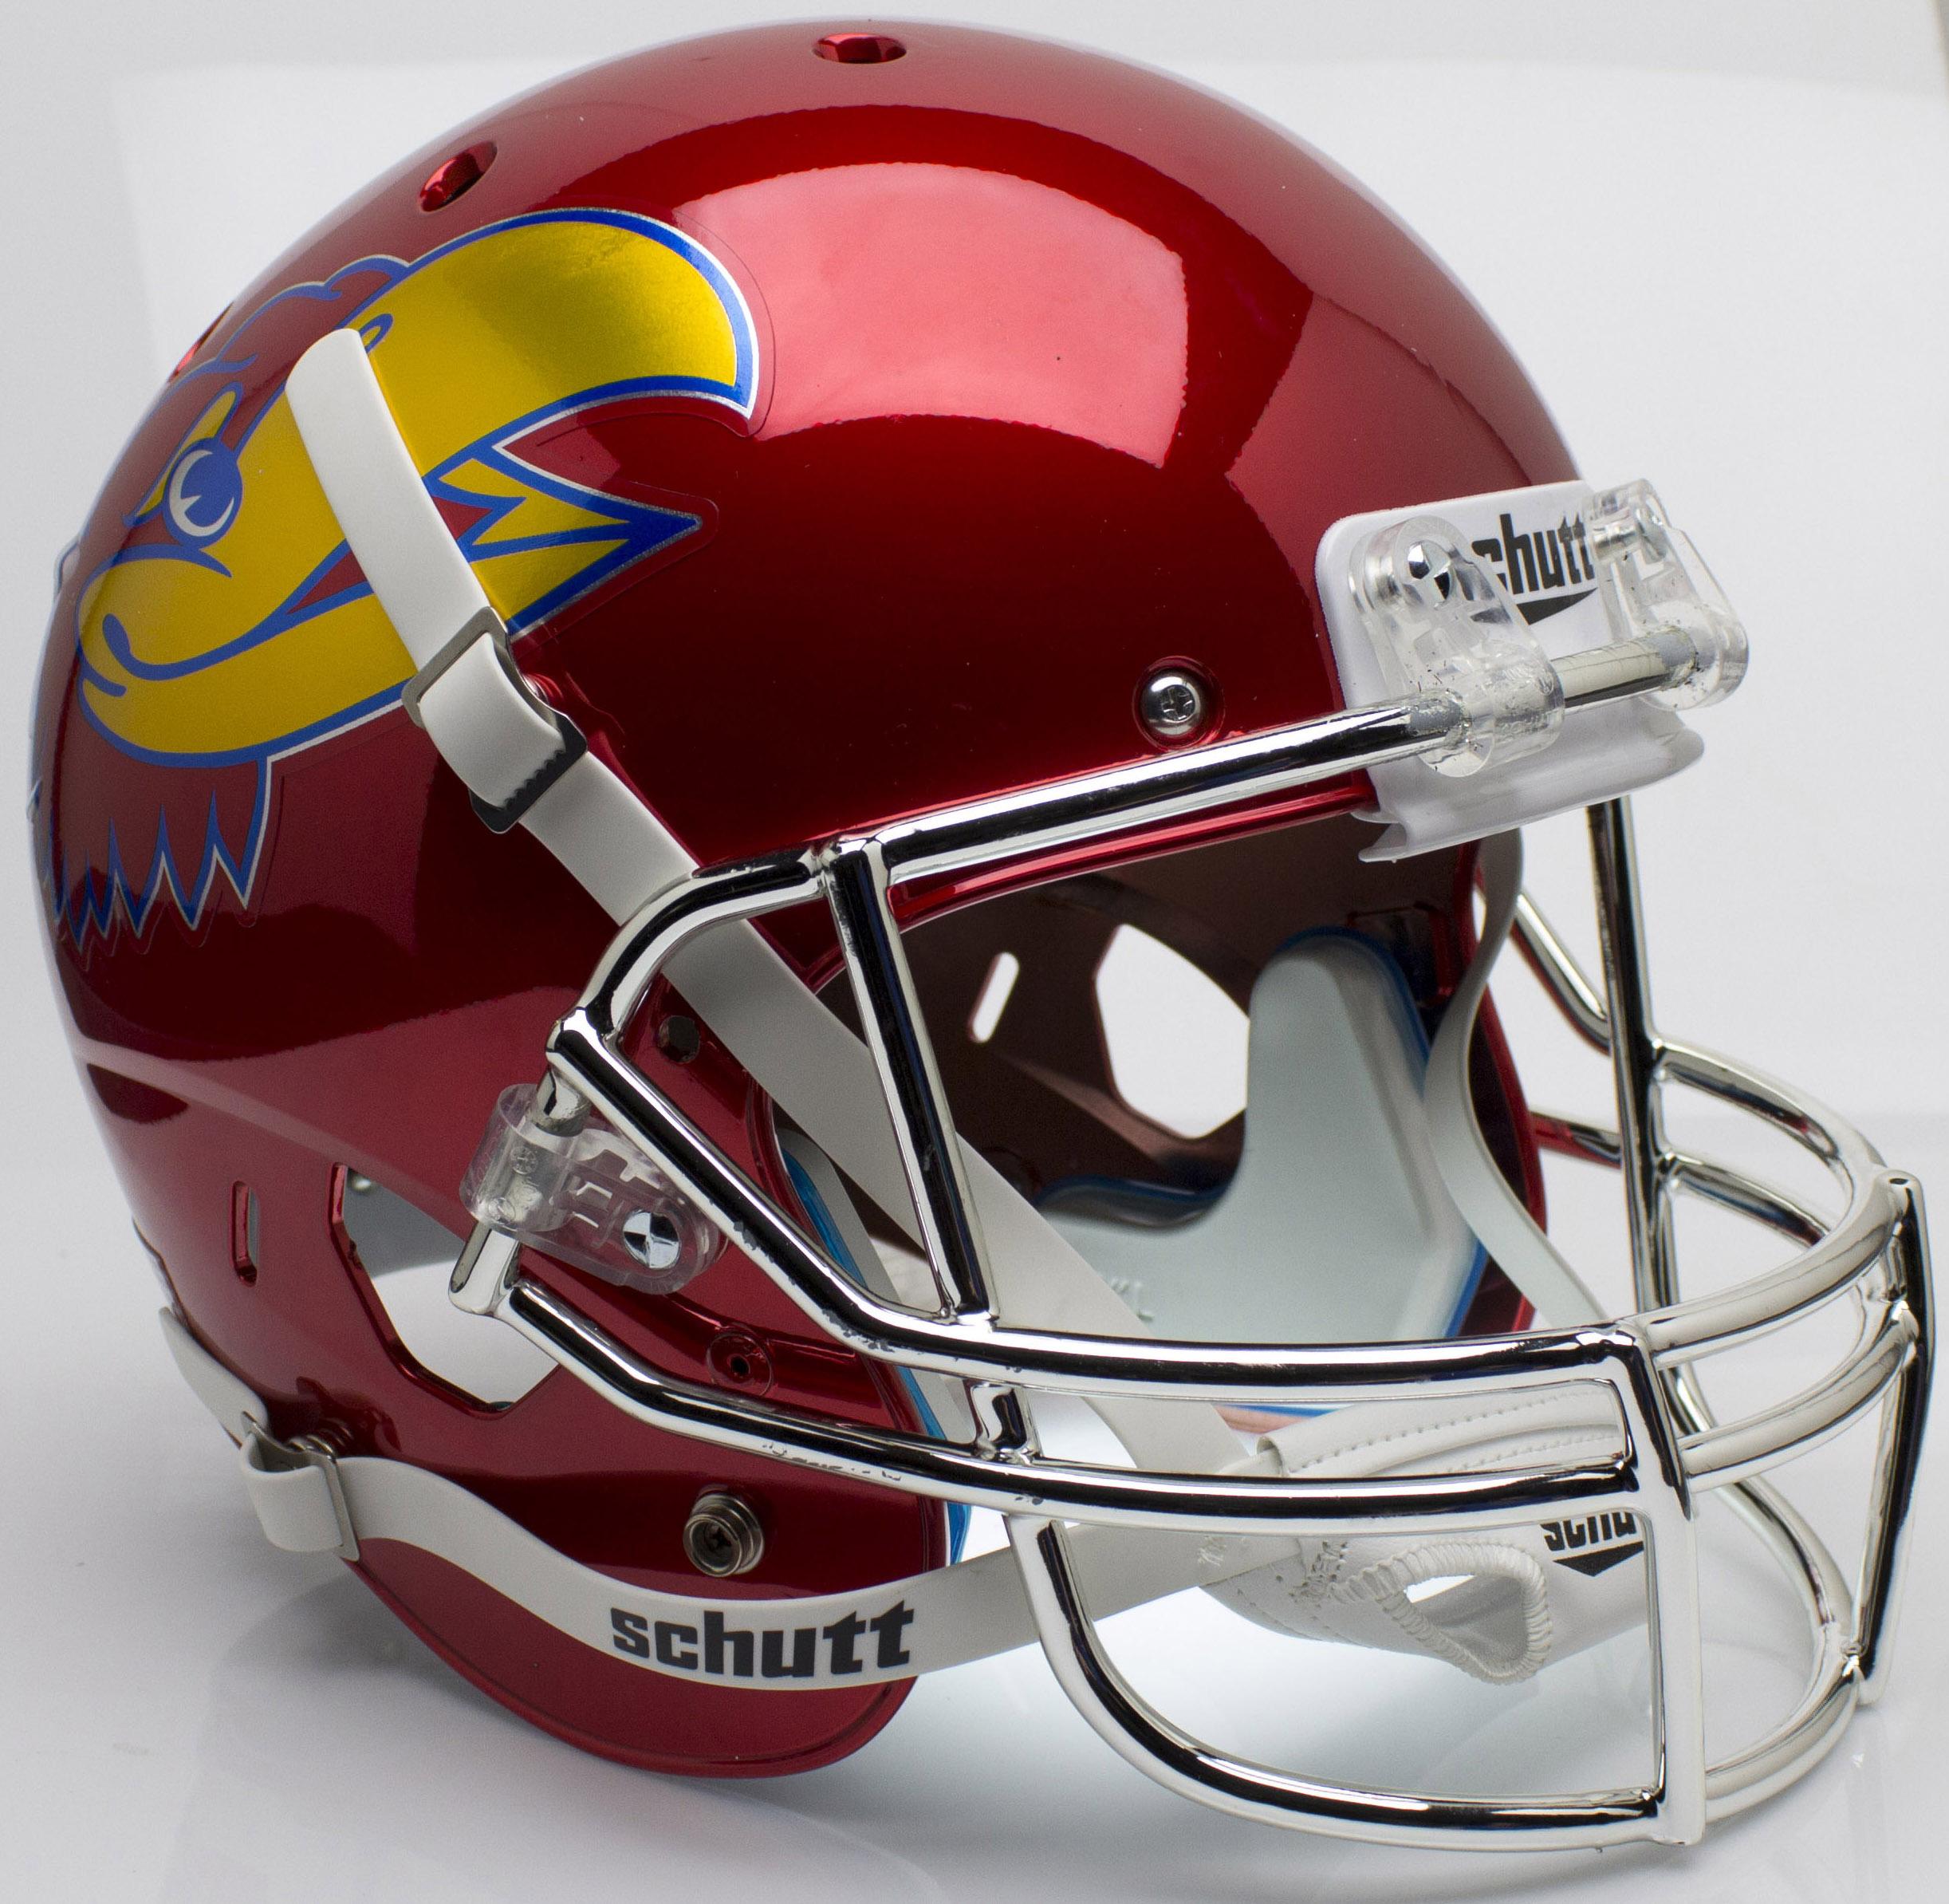 Kansas Jayhawks Full XP Replica Football Helmet Schutt <B>Scarlet Red Large Decal</B>